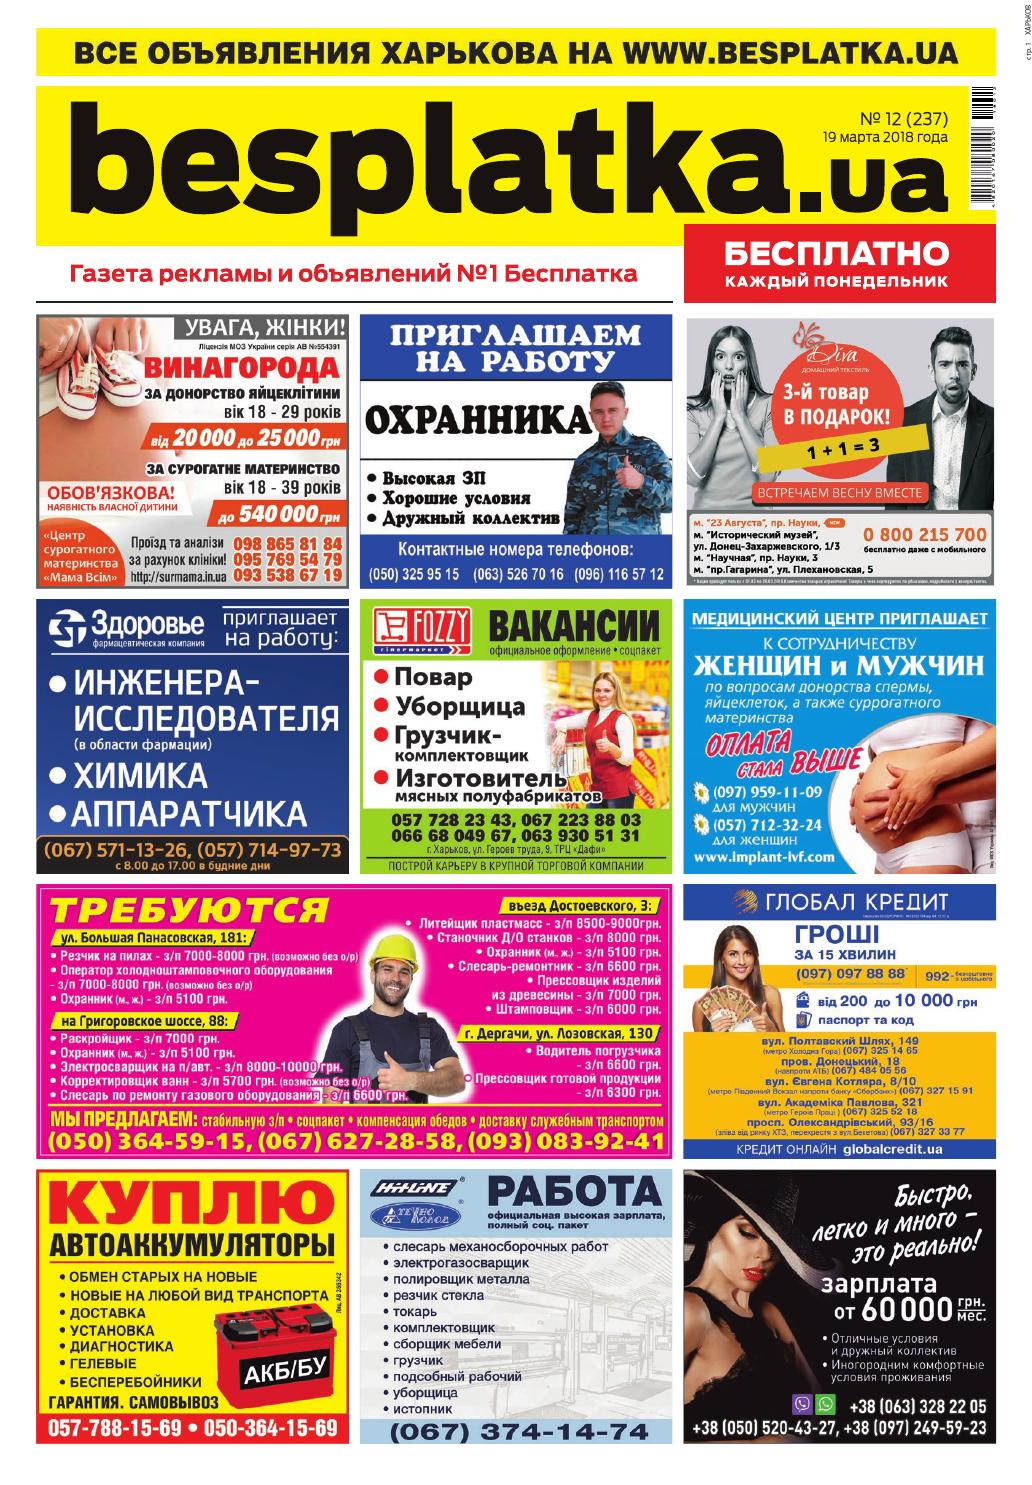 c8ab193ee Besplatka #12 Харьков by besplatka ukraine - issuu